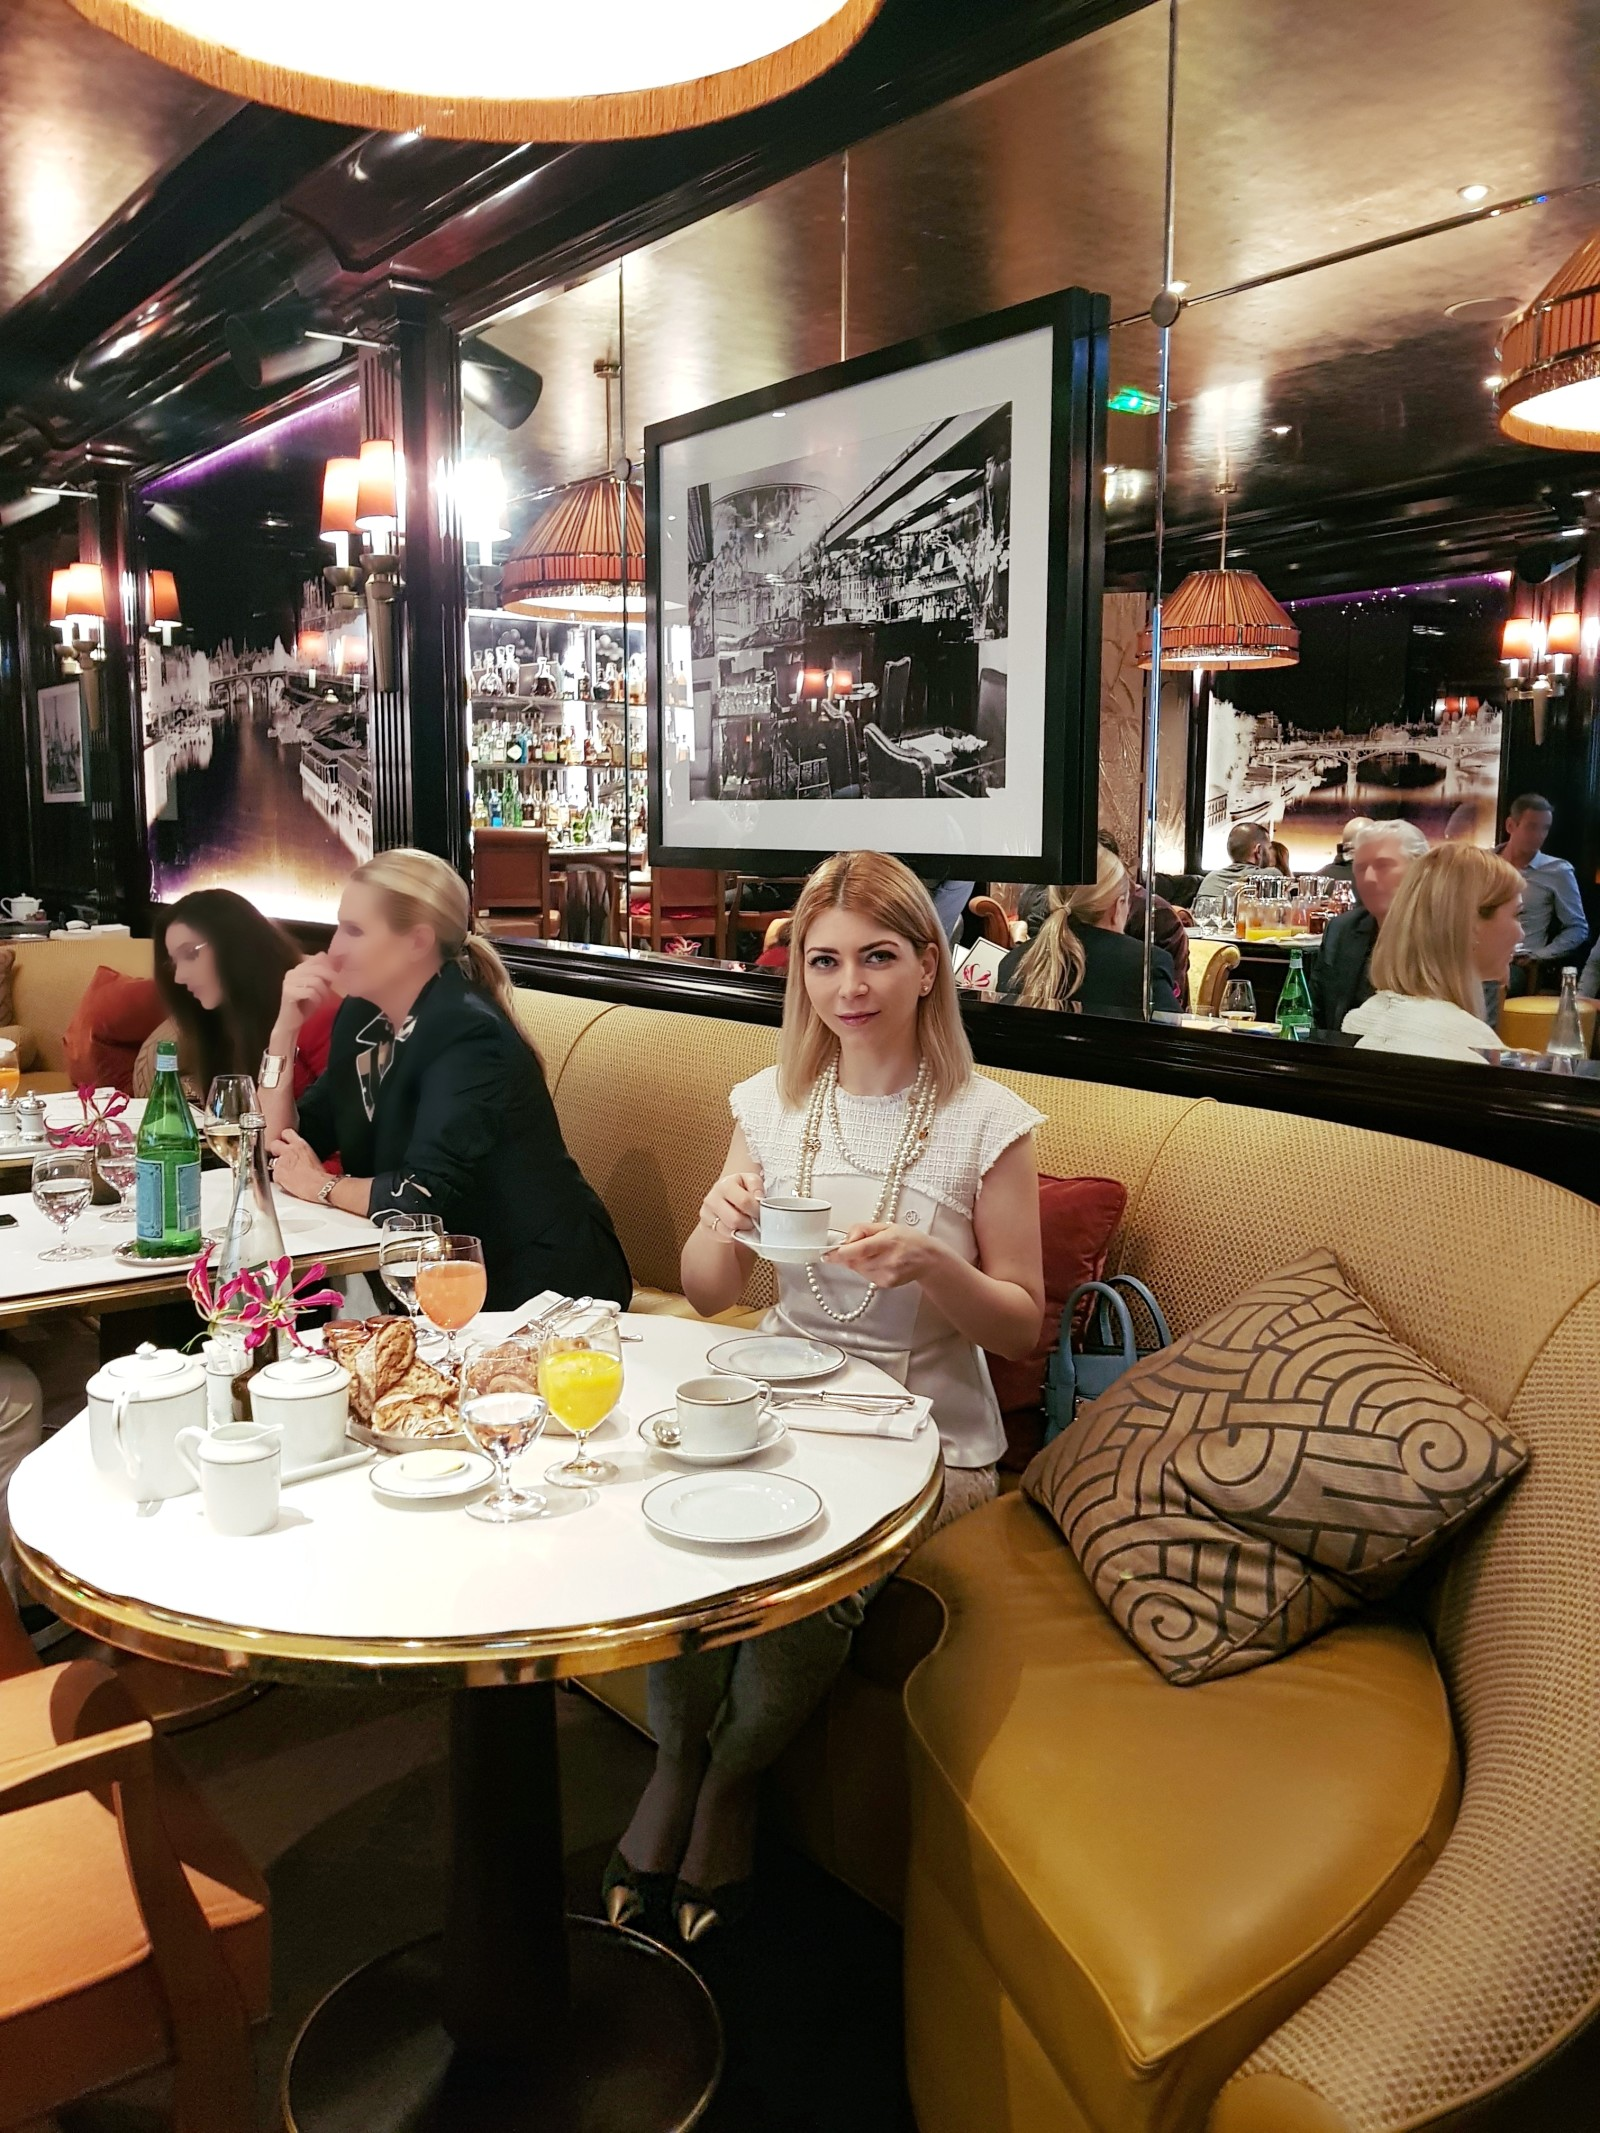 Yuliya Savytska at Brunch in Ritz Paris